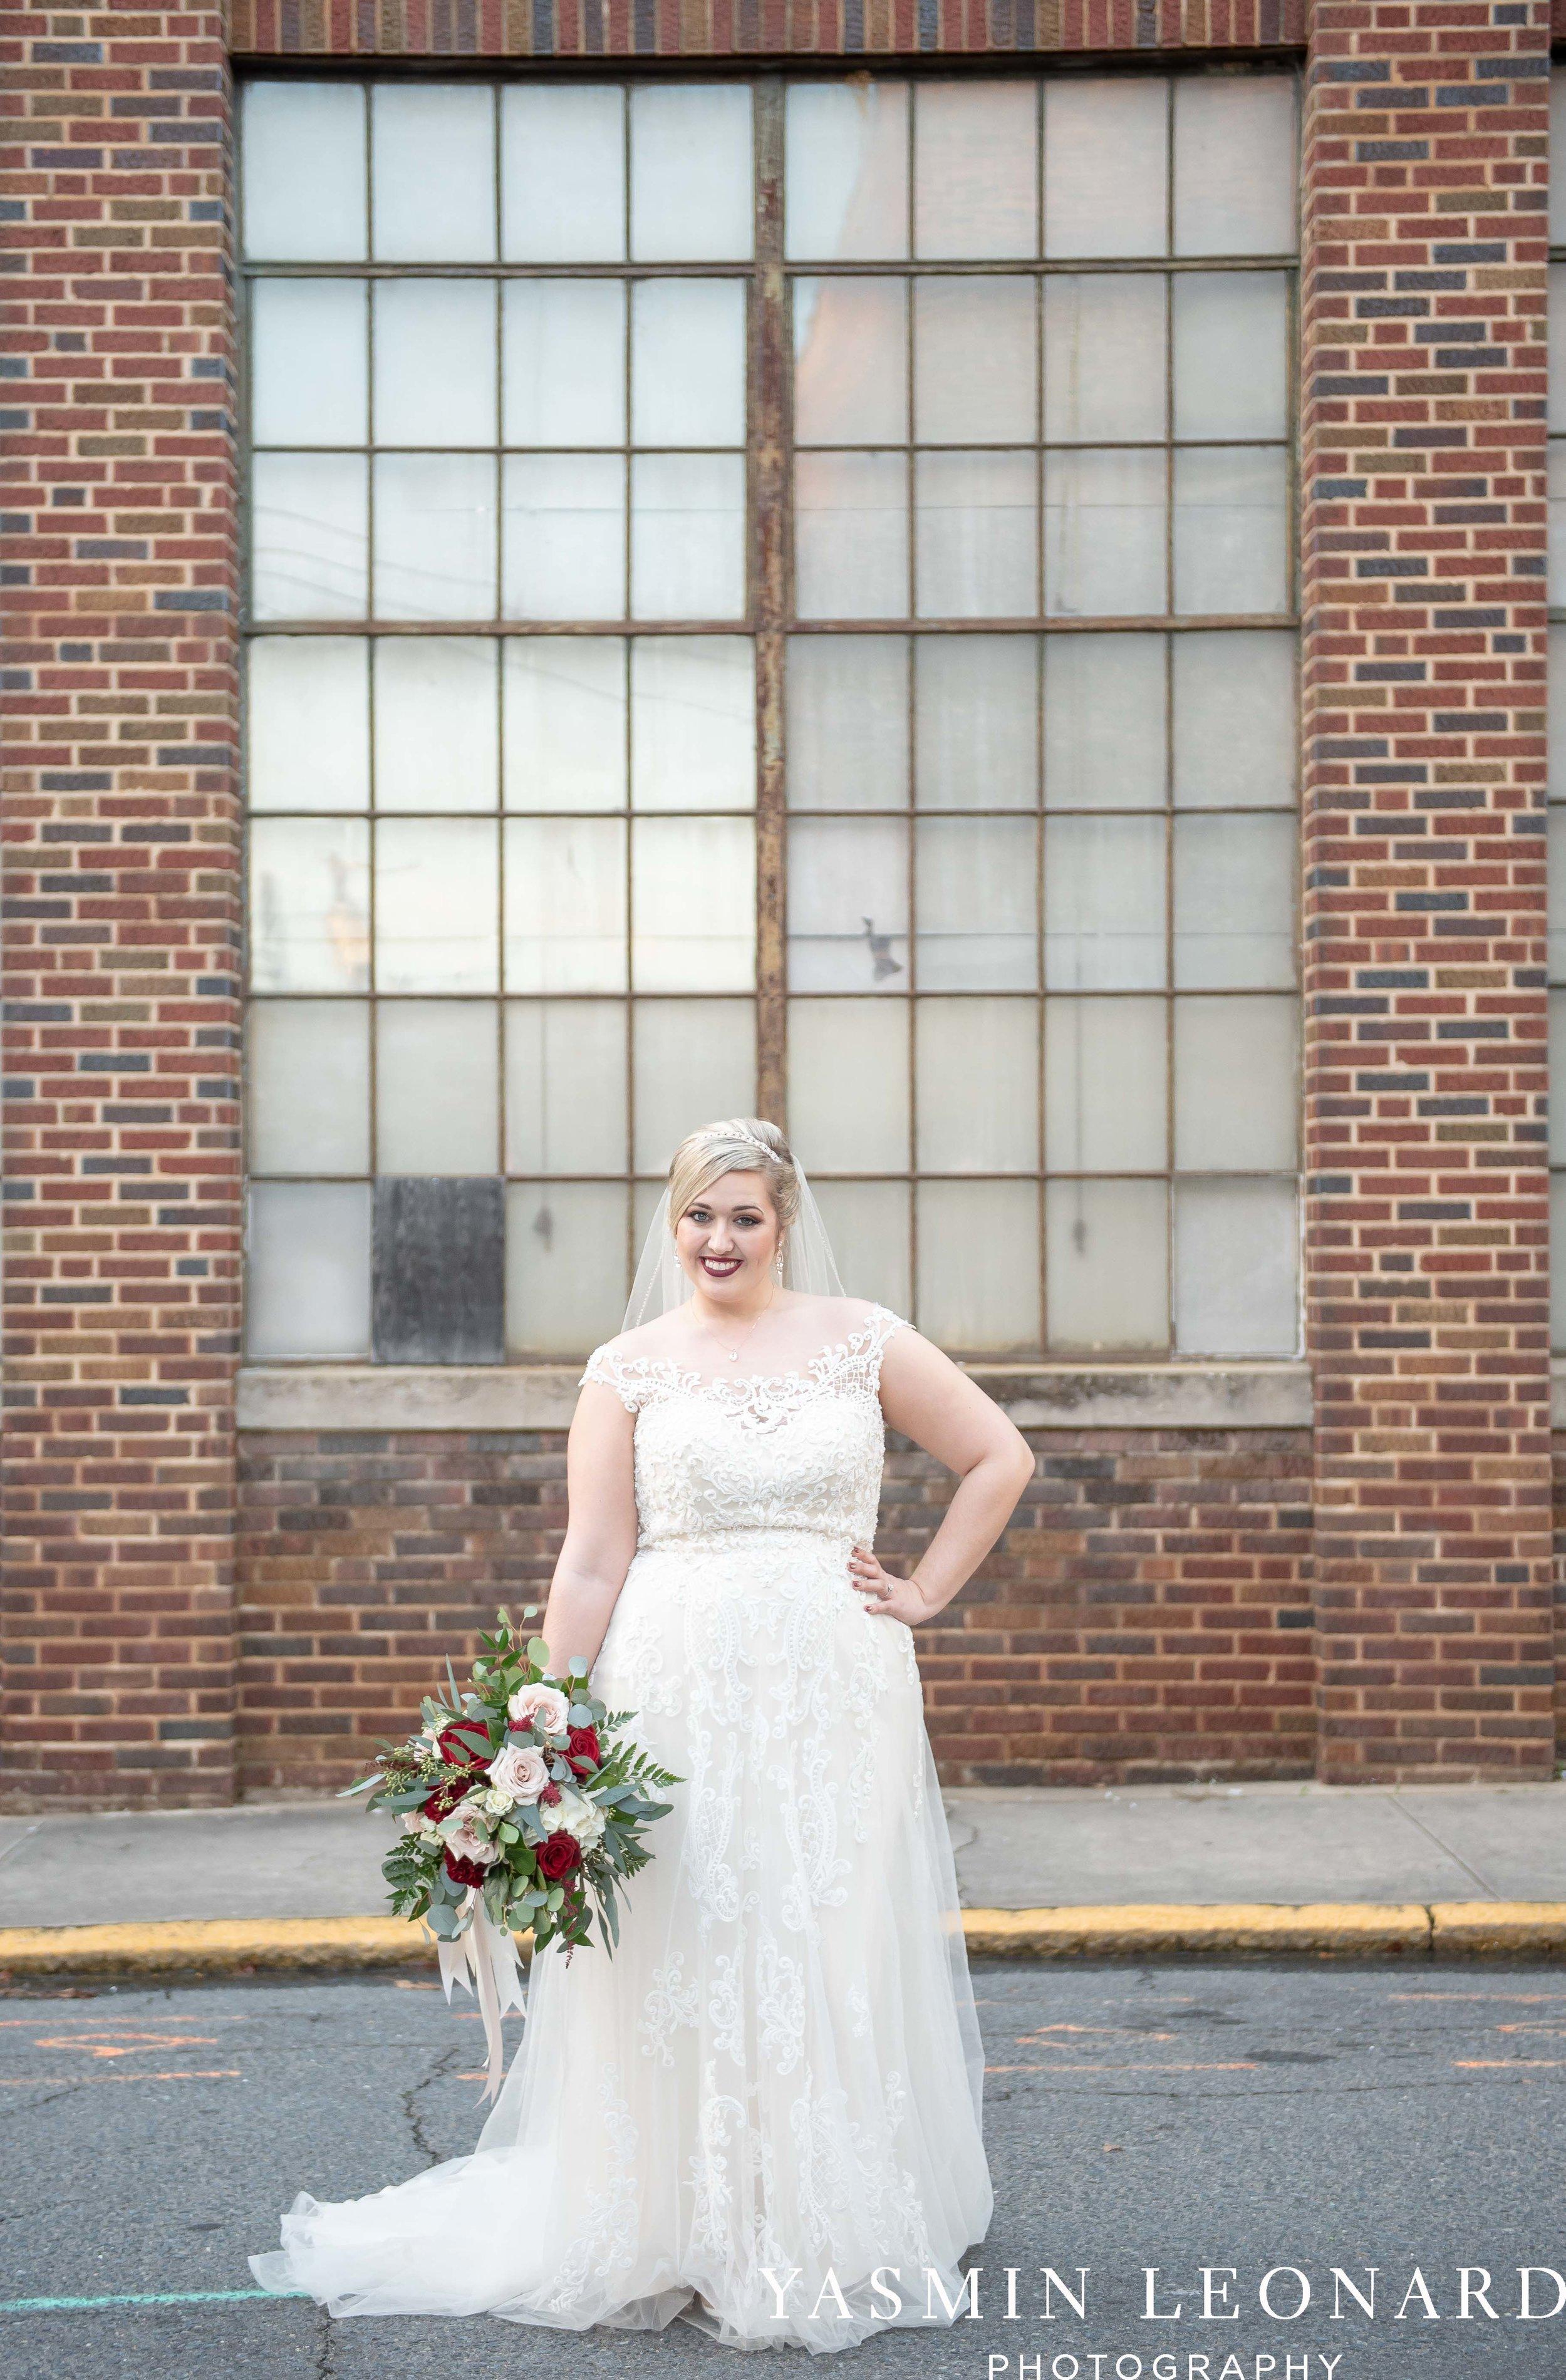 Rebekah and Matt - 105 Worth Event Centre - Yasmin Leonard Photography - Asheboro Wedding - NC Wedding - High Point Weddings - Triad Weddings - Winter Wedding-11.jpg